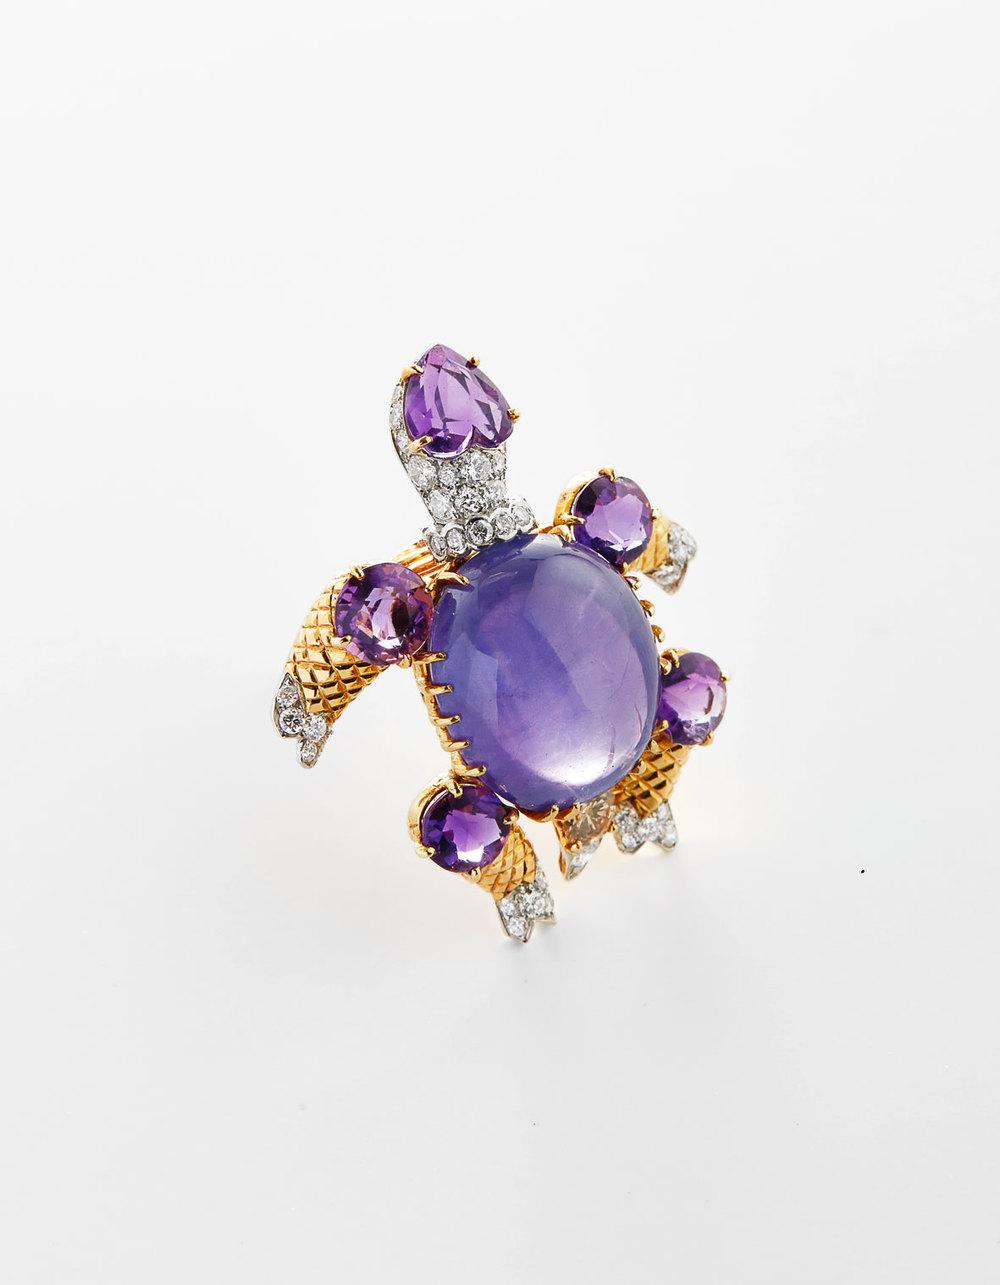 Cartier-Sapphire-Turtle_1-copy.jpg